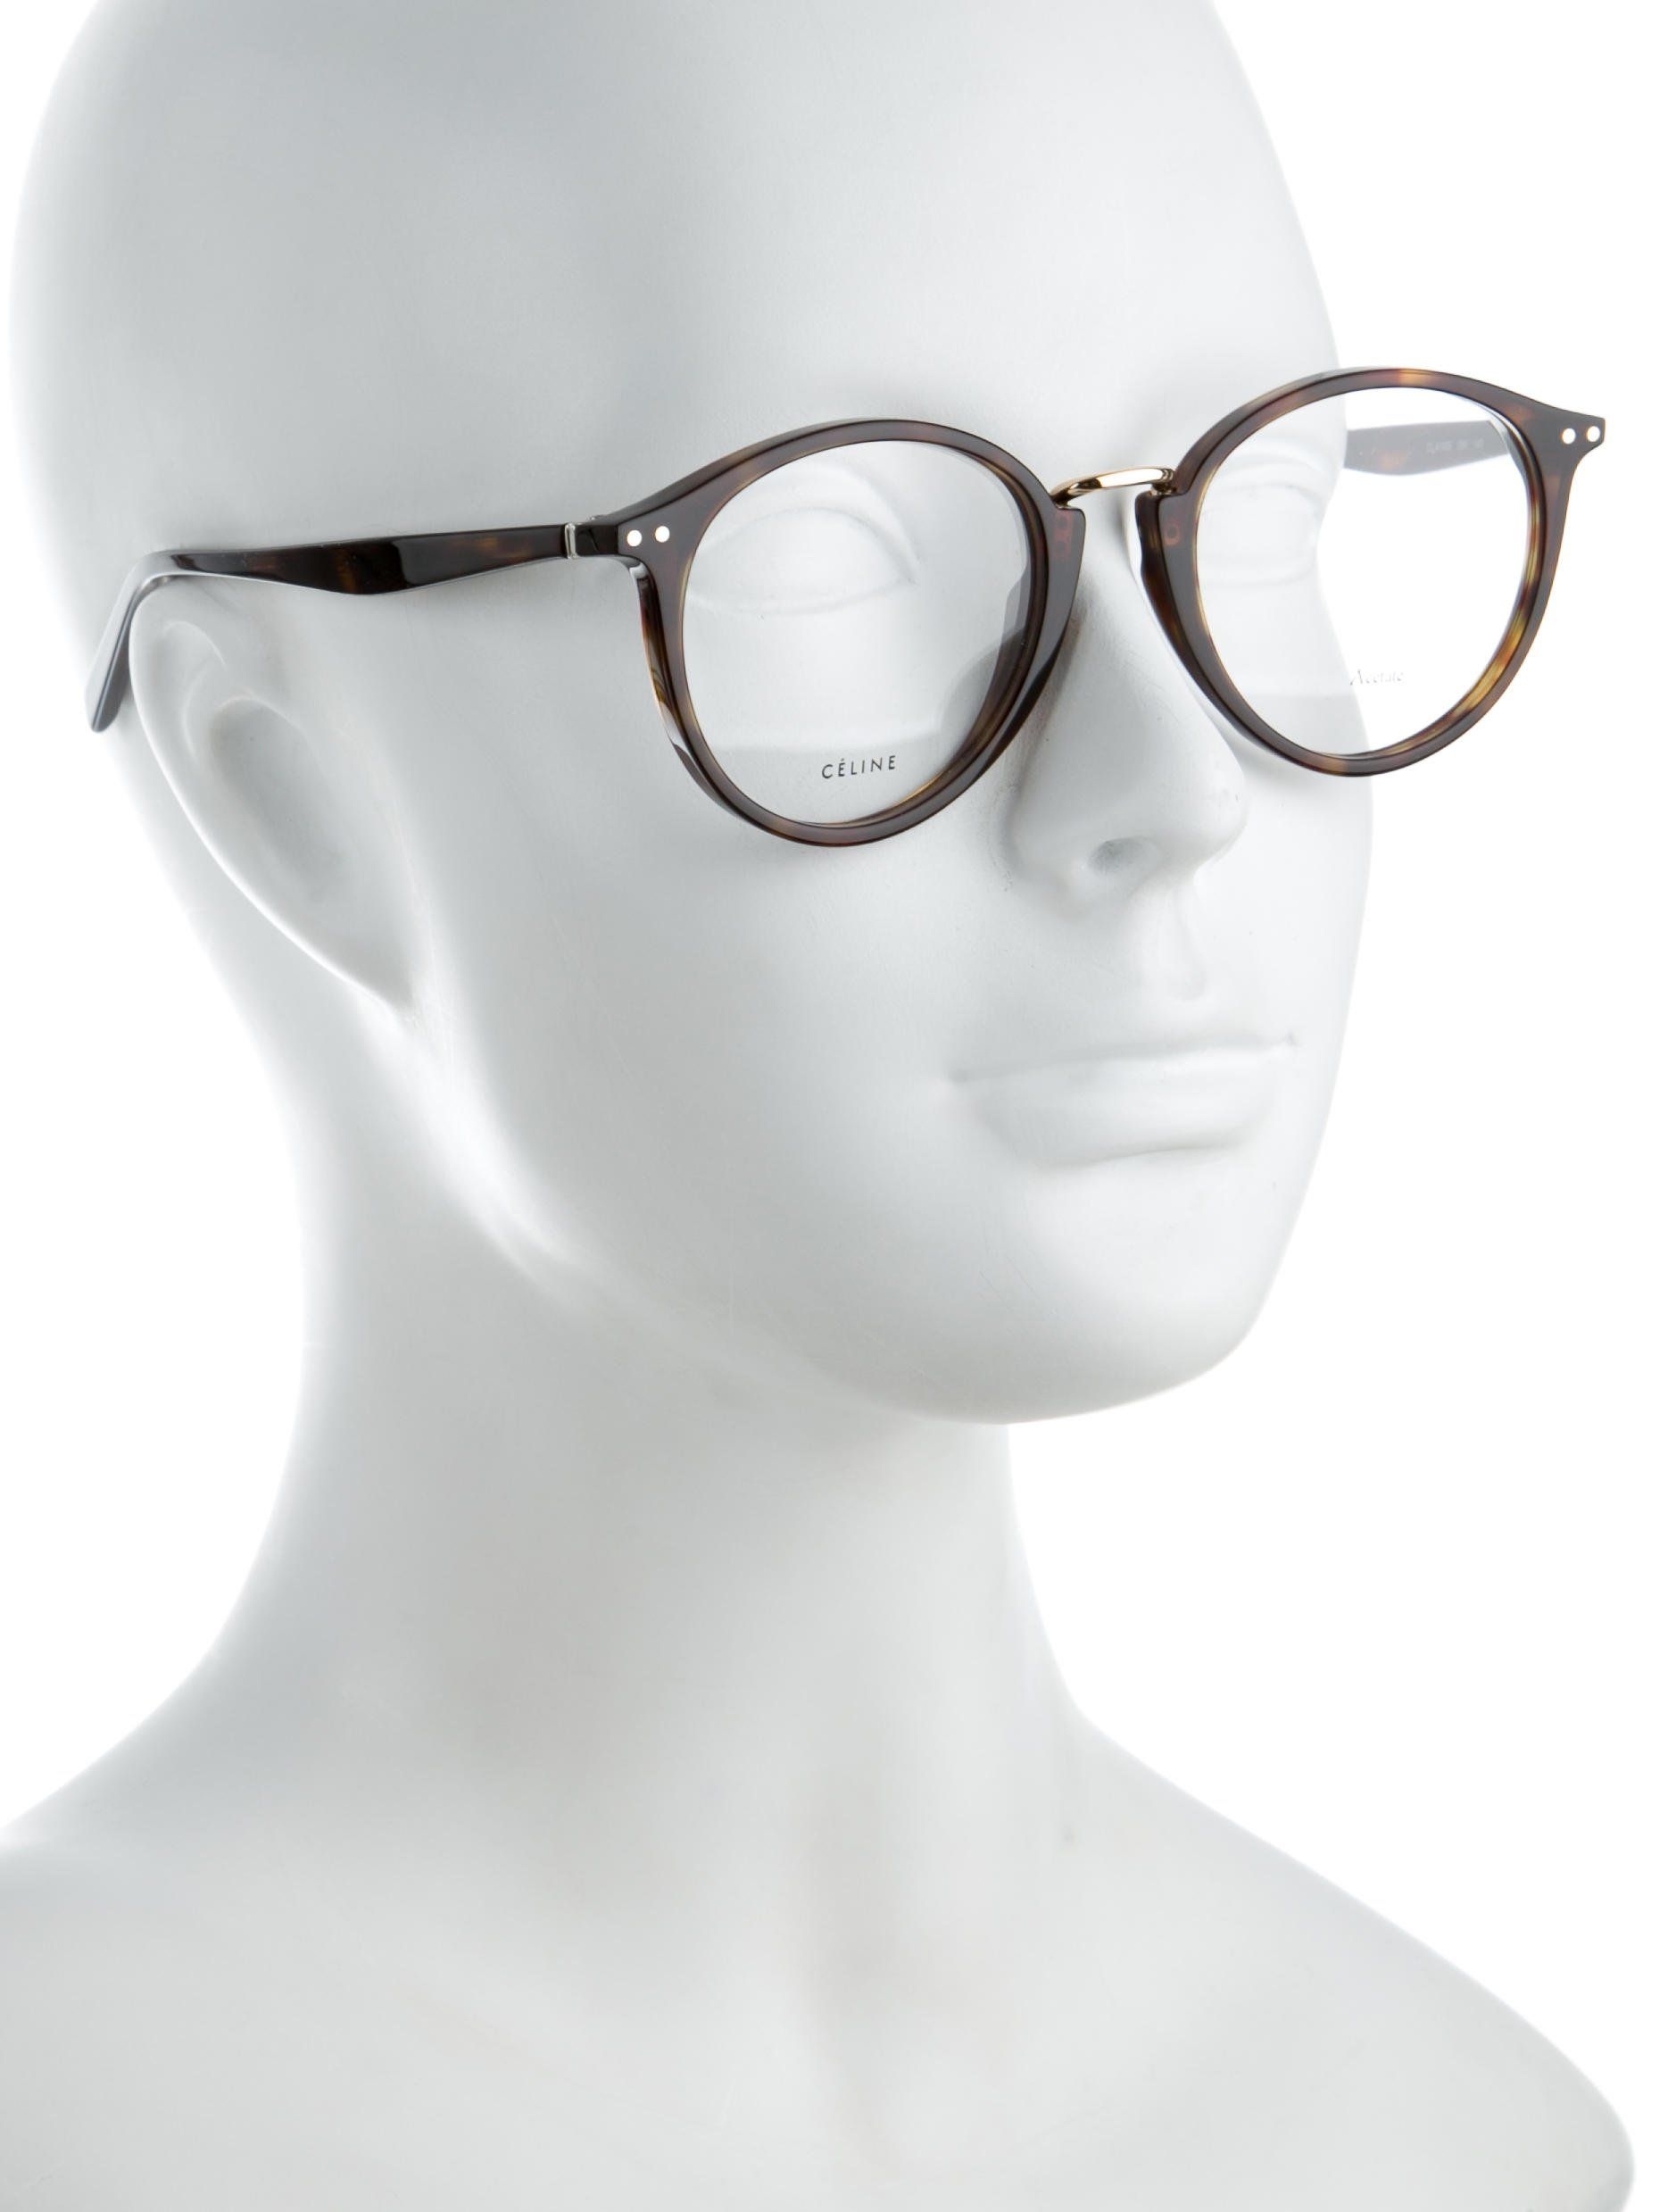 b4cad232d8 Tortoiseshell acetate C¨¦line round eyeglasses with clear lenses